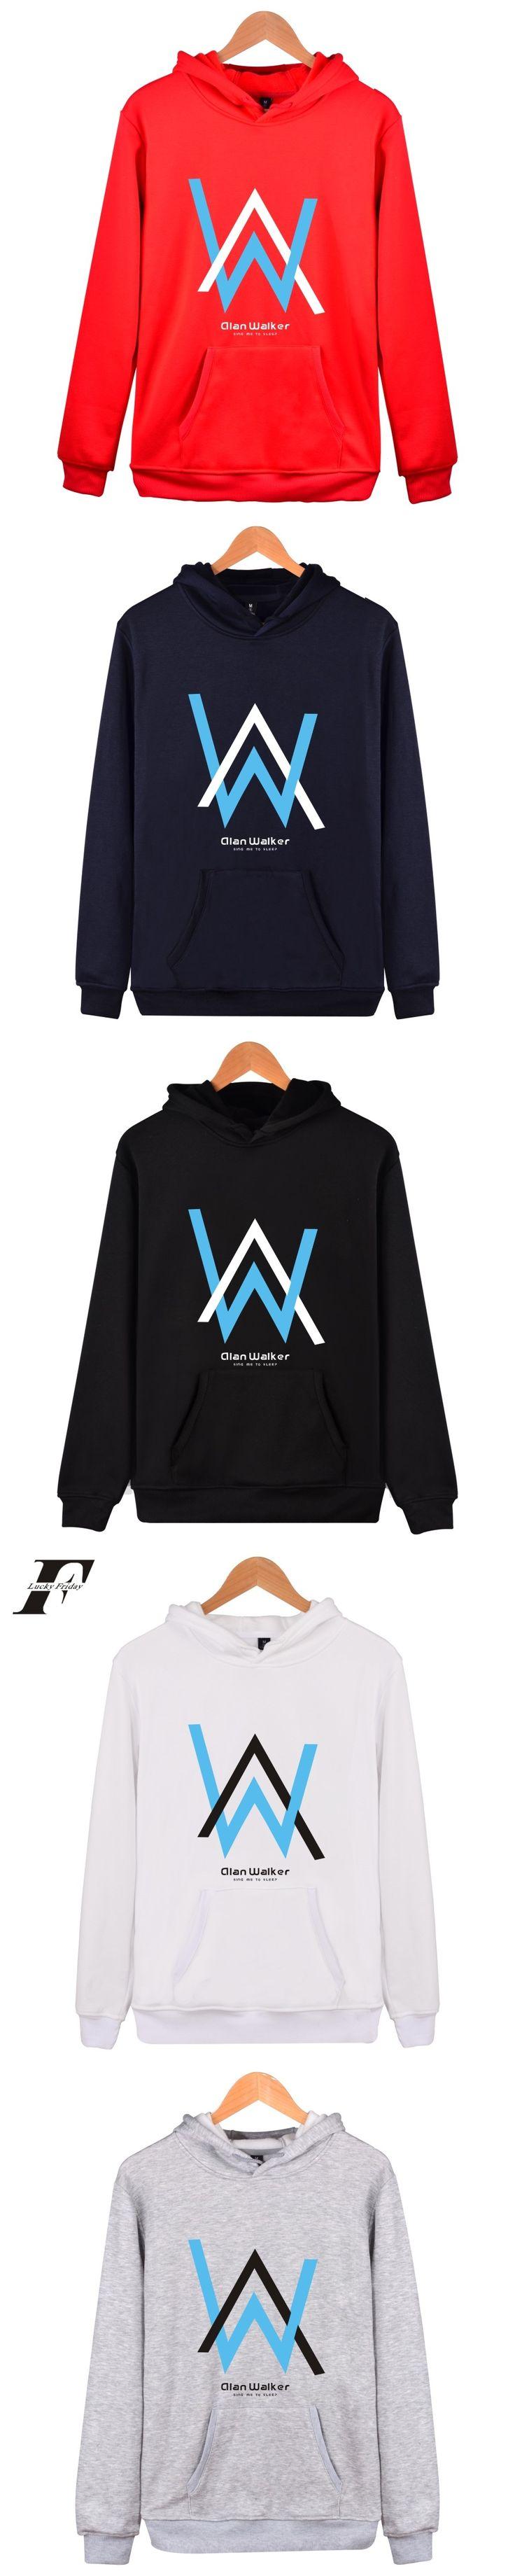 LUCKYFRIDAYF Alan Walker 2017 New DJ Electronic Sound Women/Men Hoodies and Sweatshirt Fashion Cotton Hoodies Kpop Plus Size 4XL